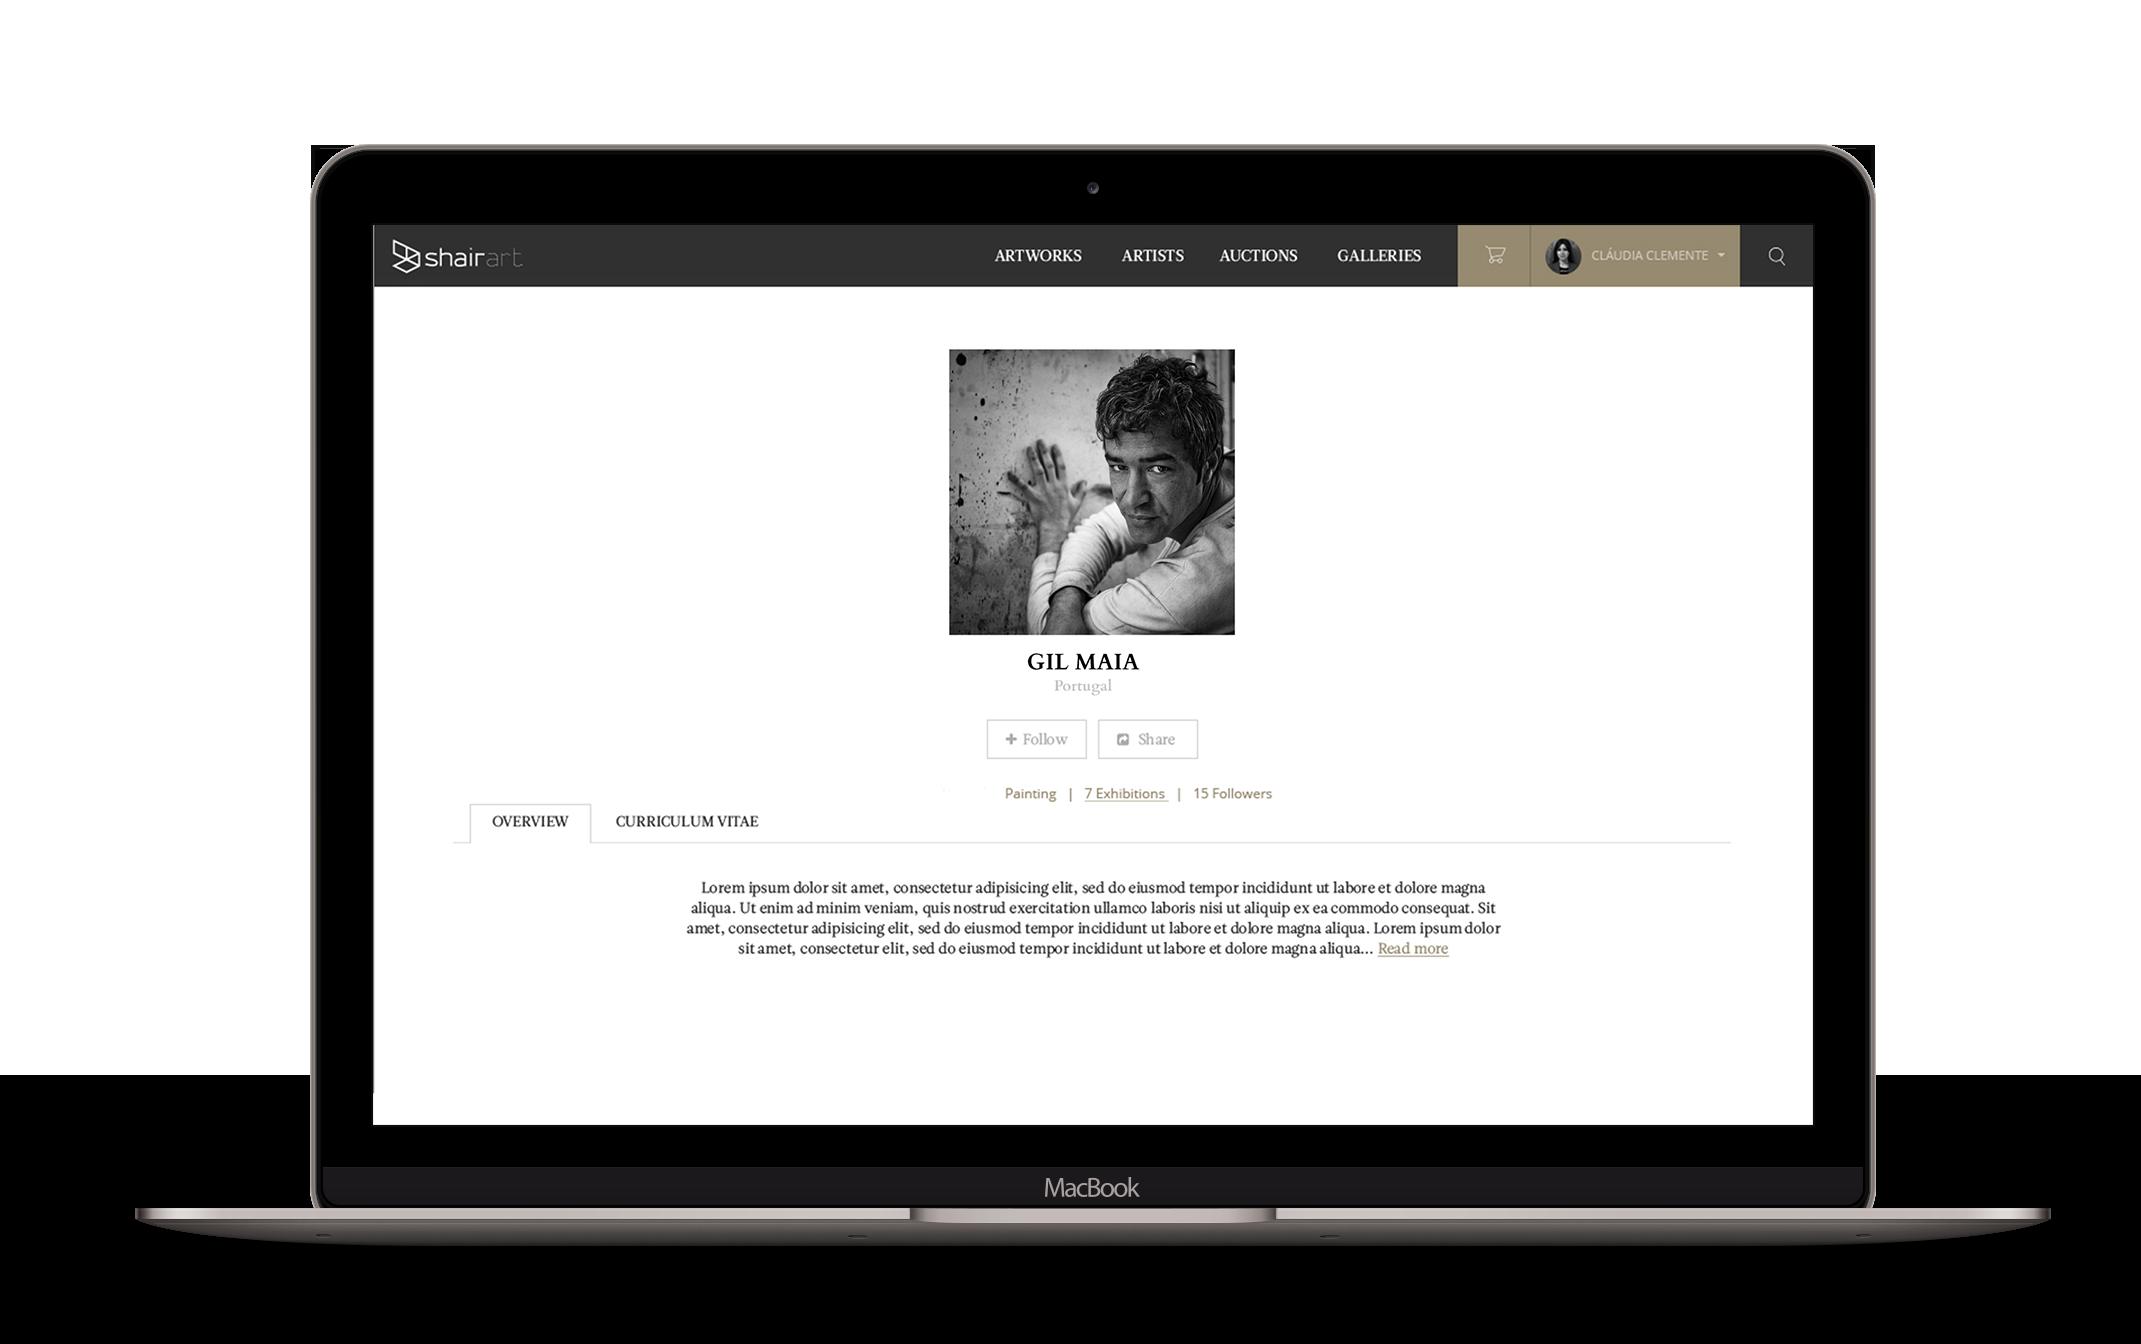 artist profile on macbook